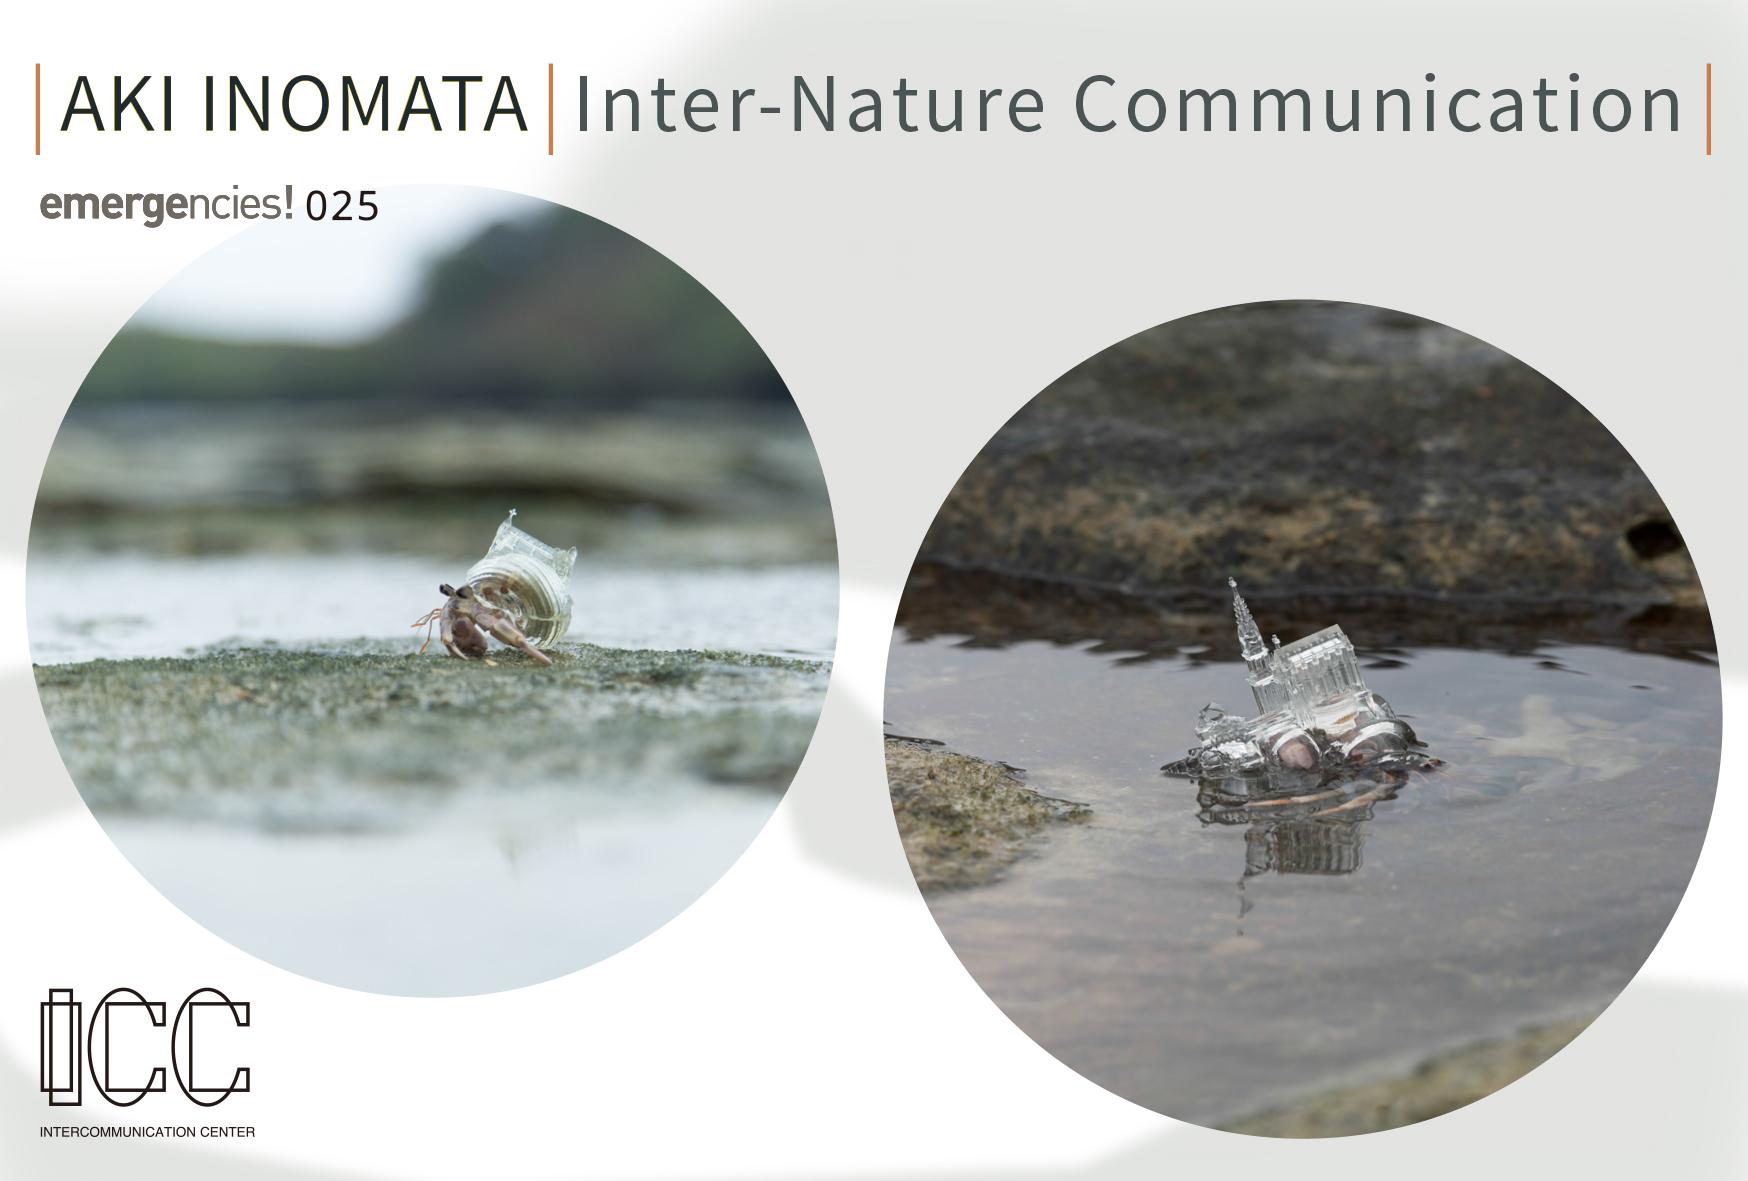 Exhibition: エマージェンシーズ! 025 AKI INOMATA / Inter-Nature Communication